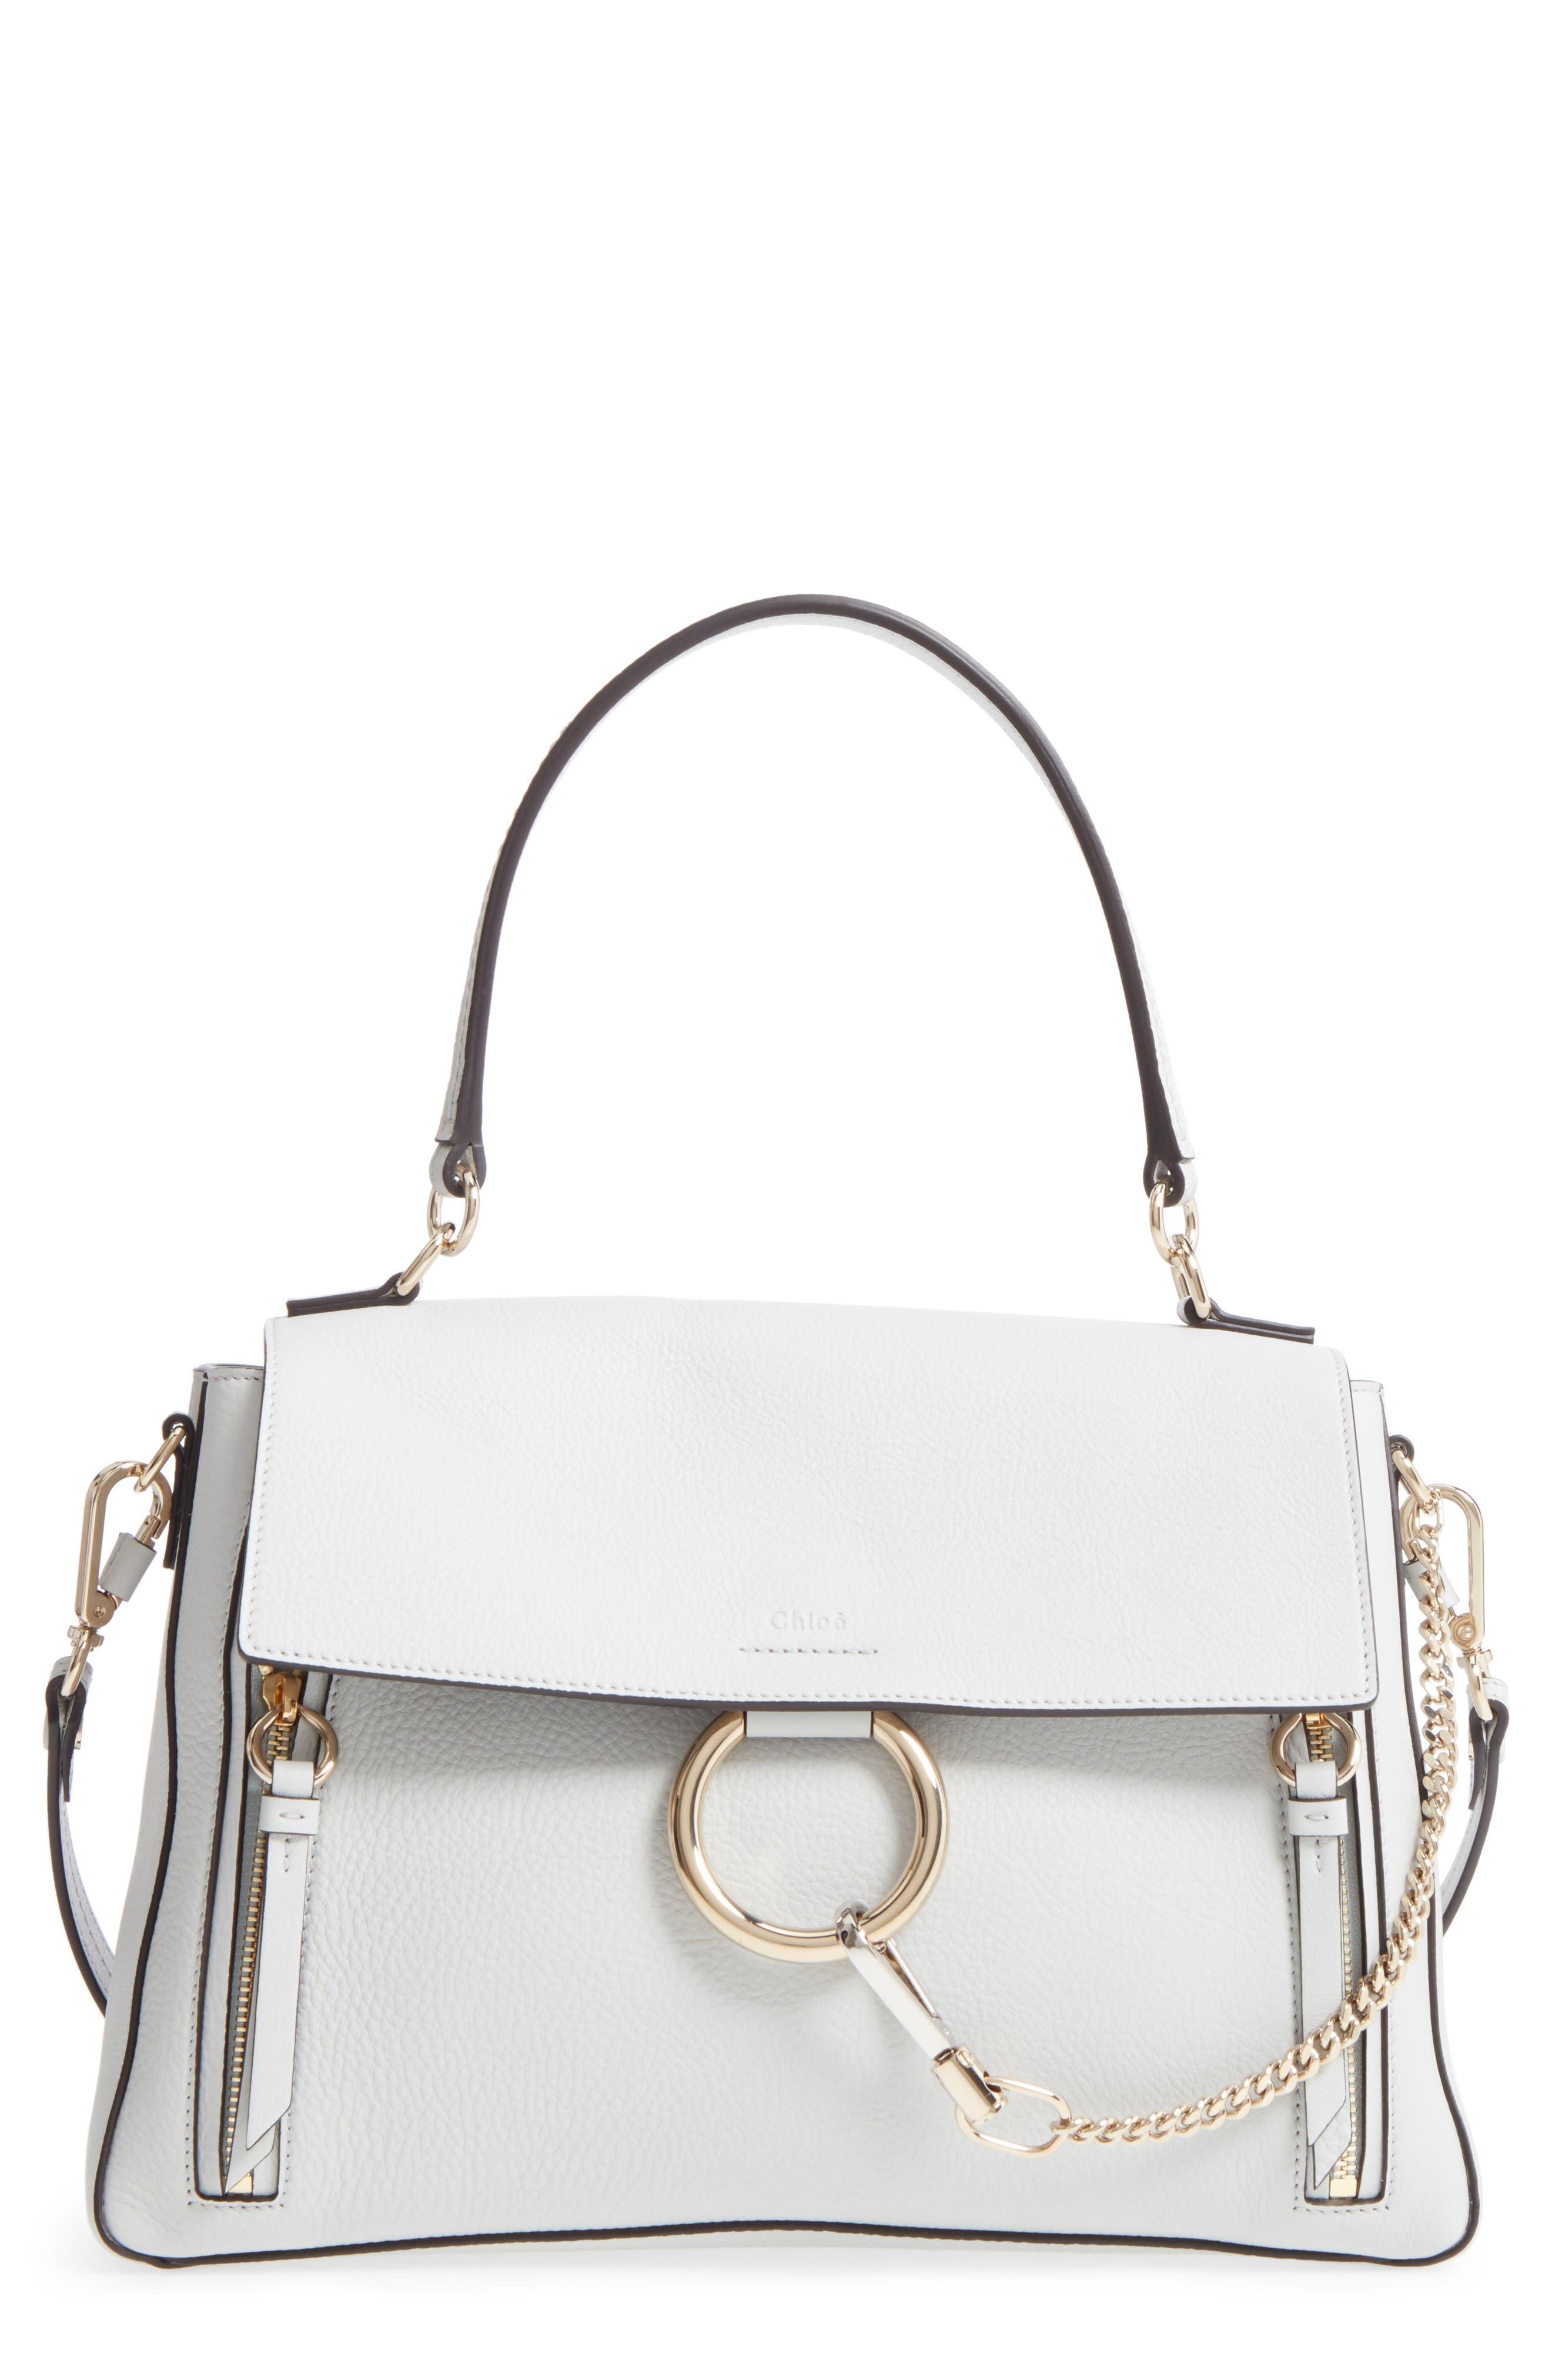 Main Image - Chloé Medium Faye Leather Shoulder Bag